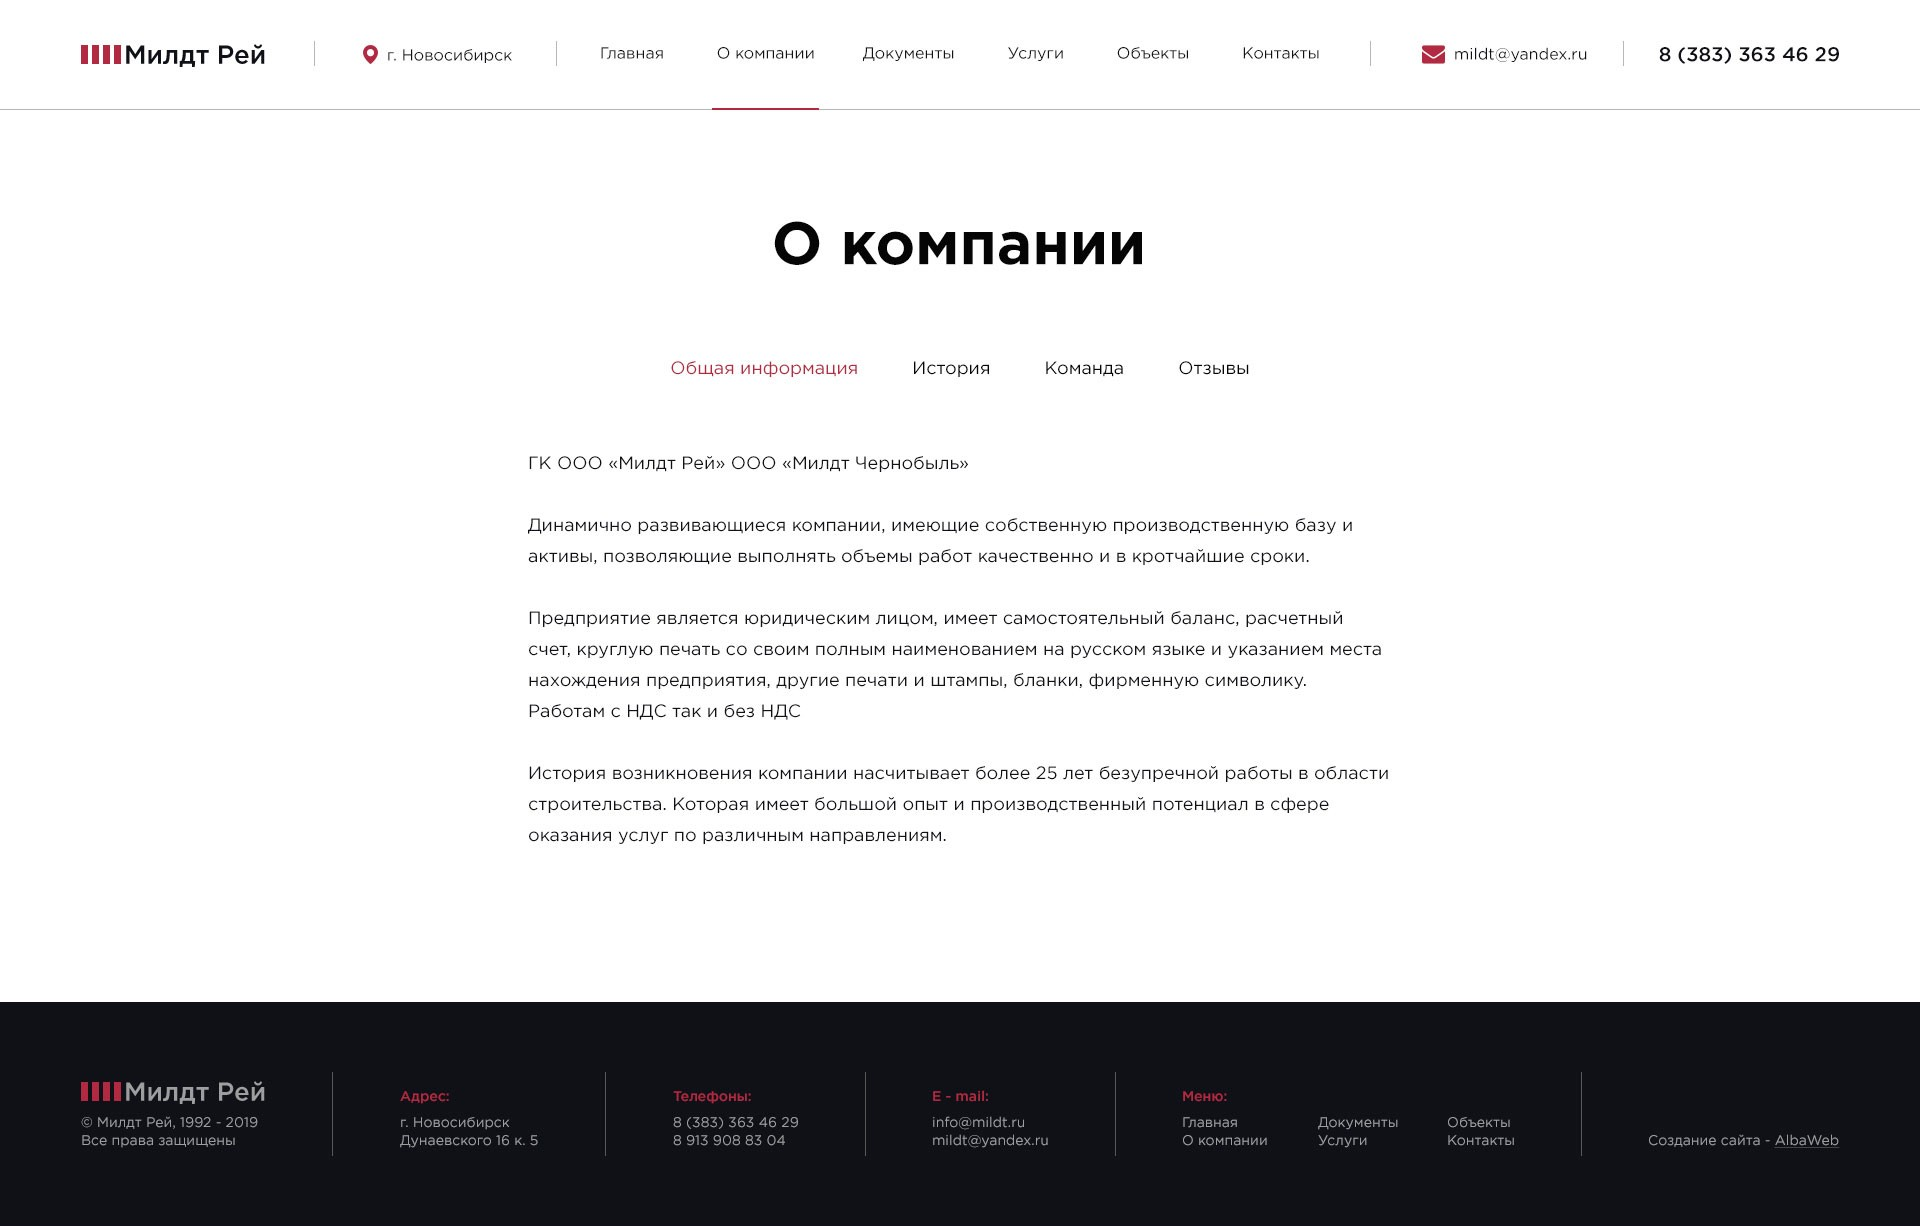 maket 1758px o kompanii obshhaja informacija - Милдт Рей